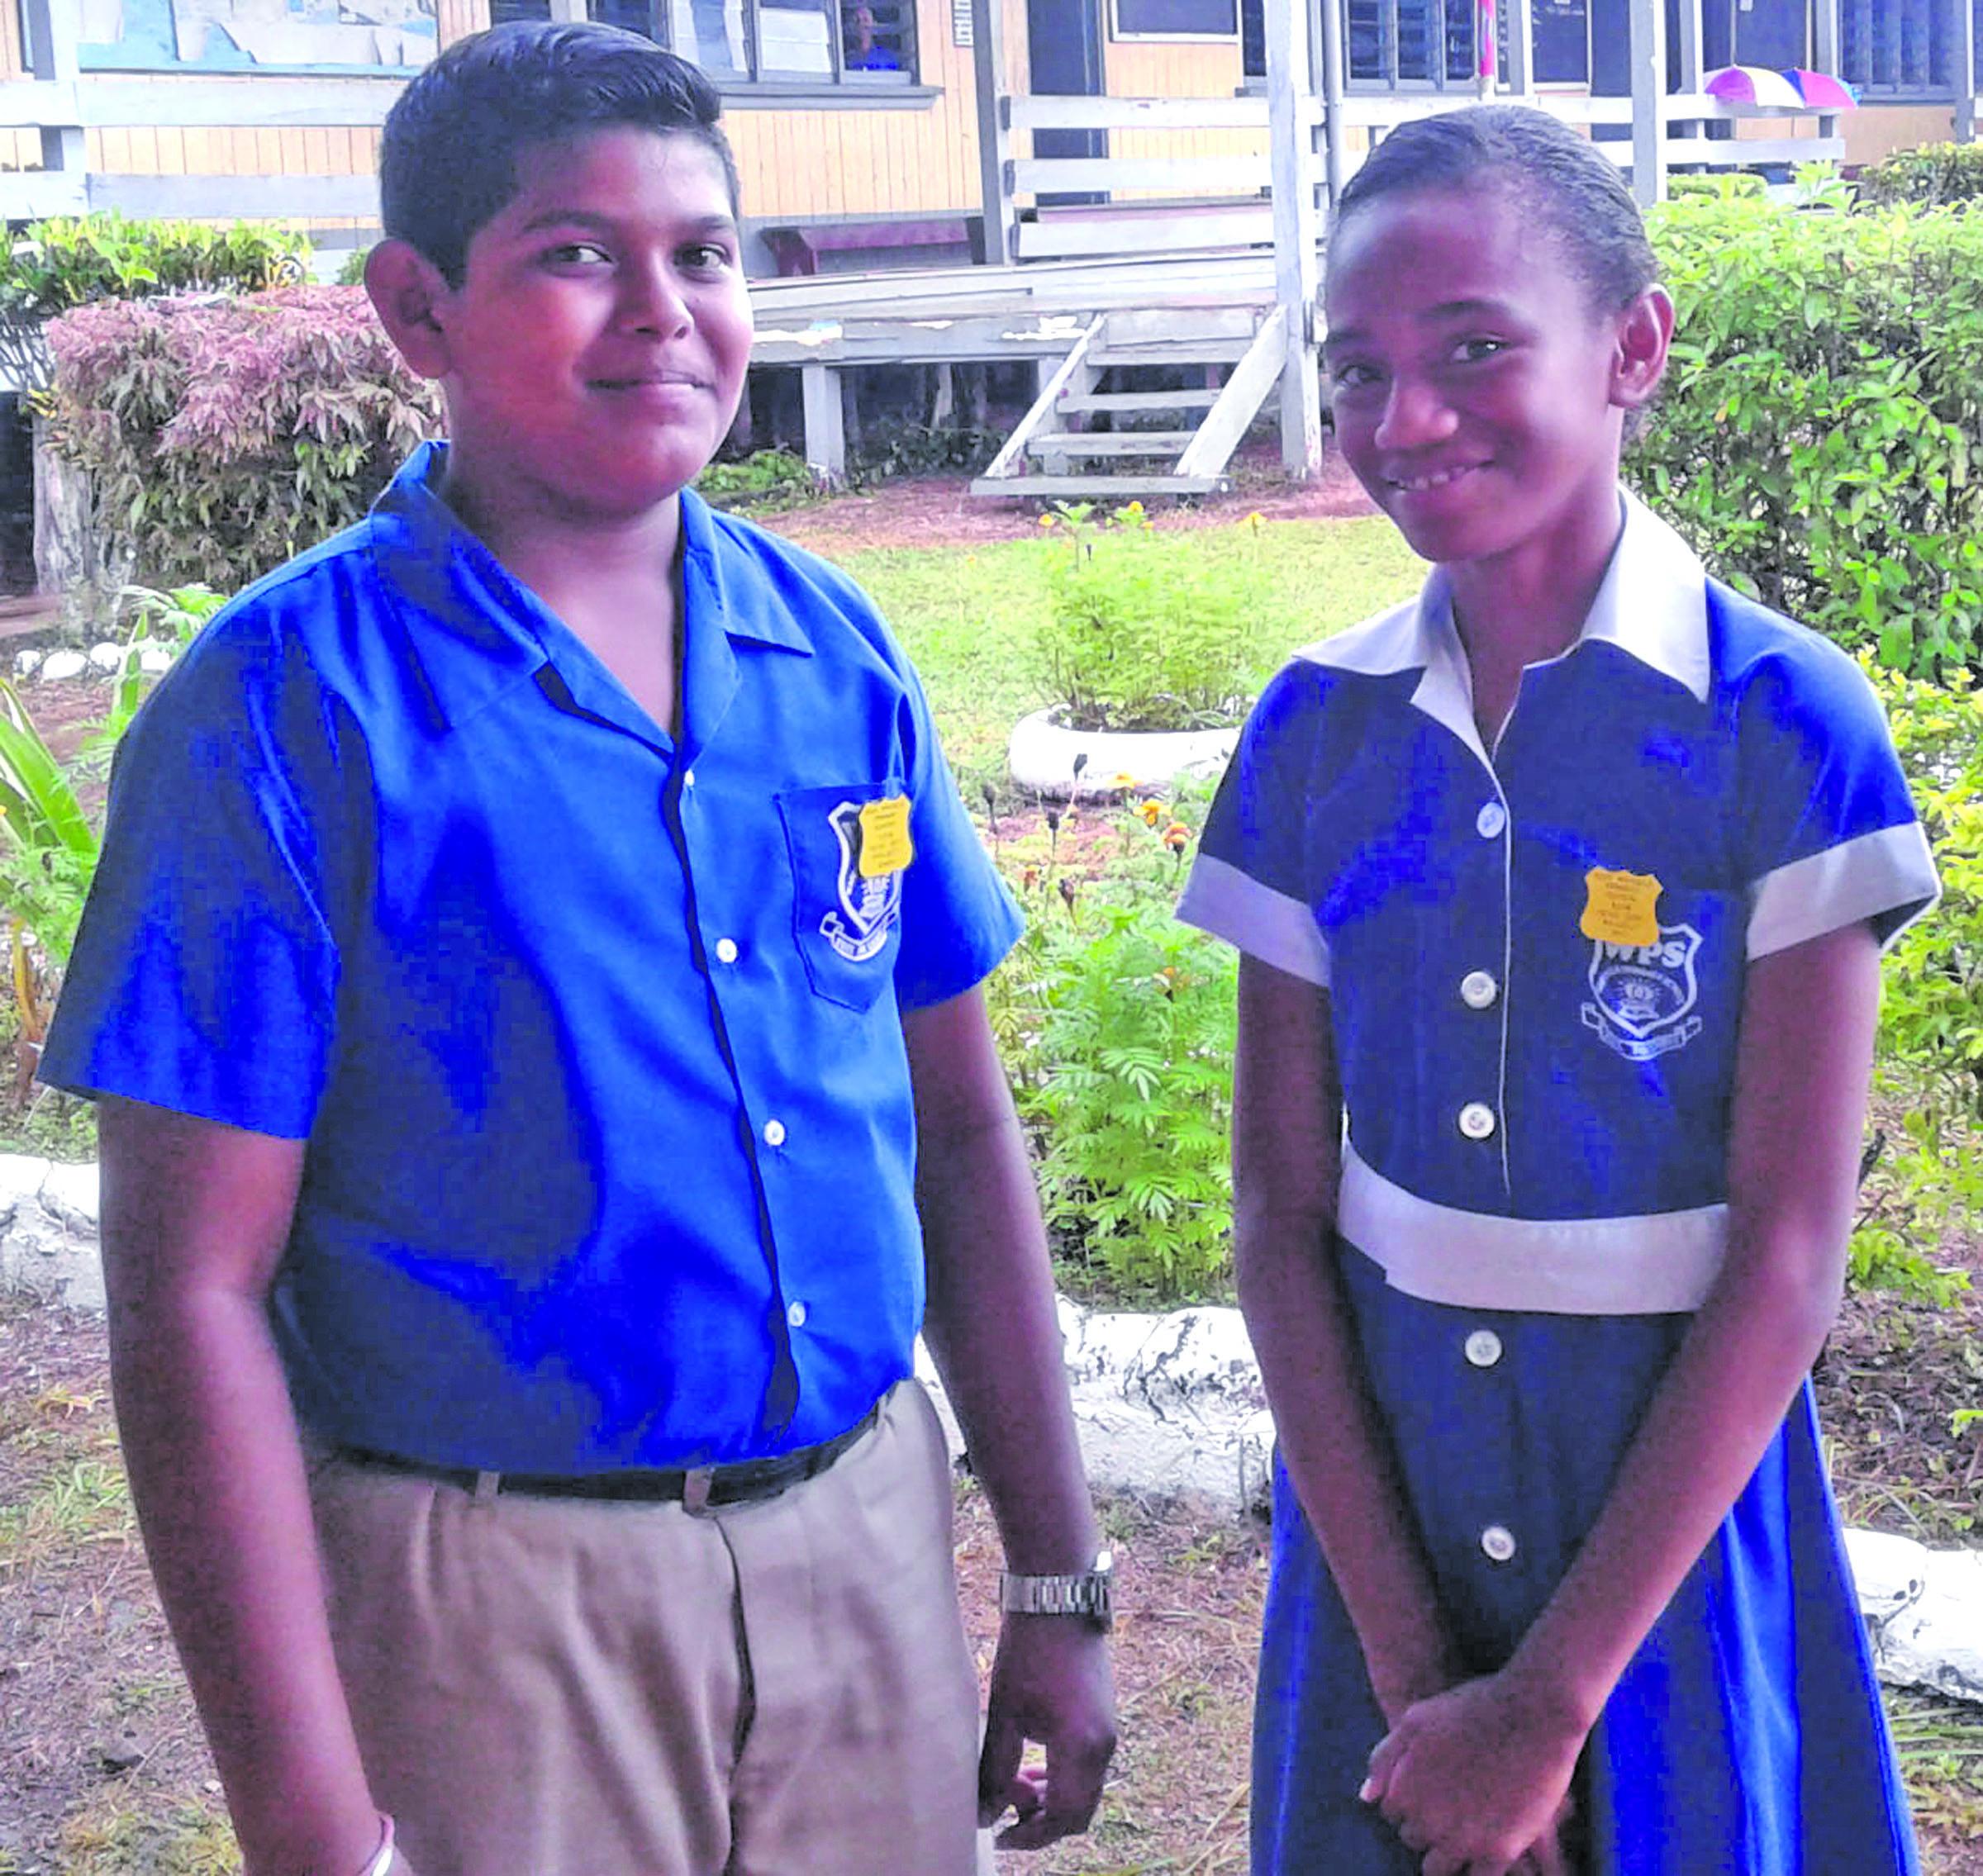 Waiqele Primary School headboy Prajeet Singh (left), and headgirl Raijeli Biu in Labasa on February 1, 2018.